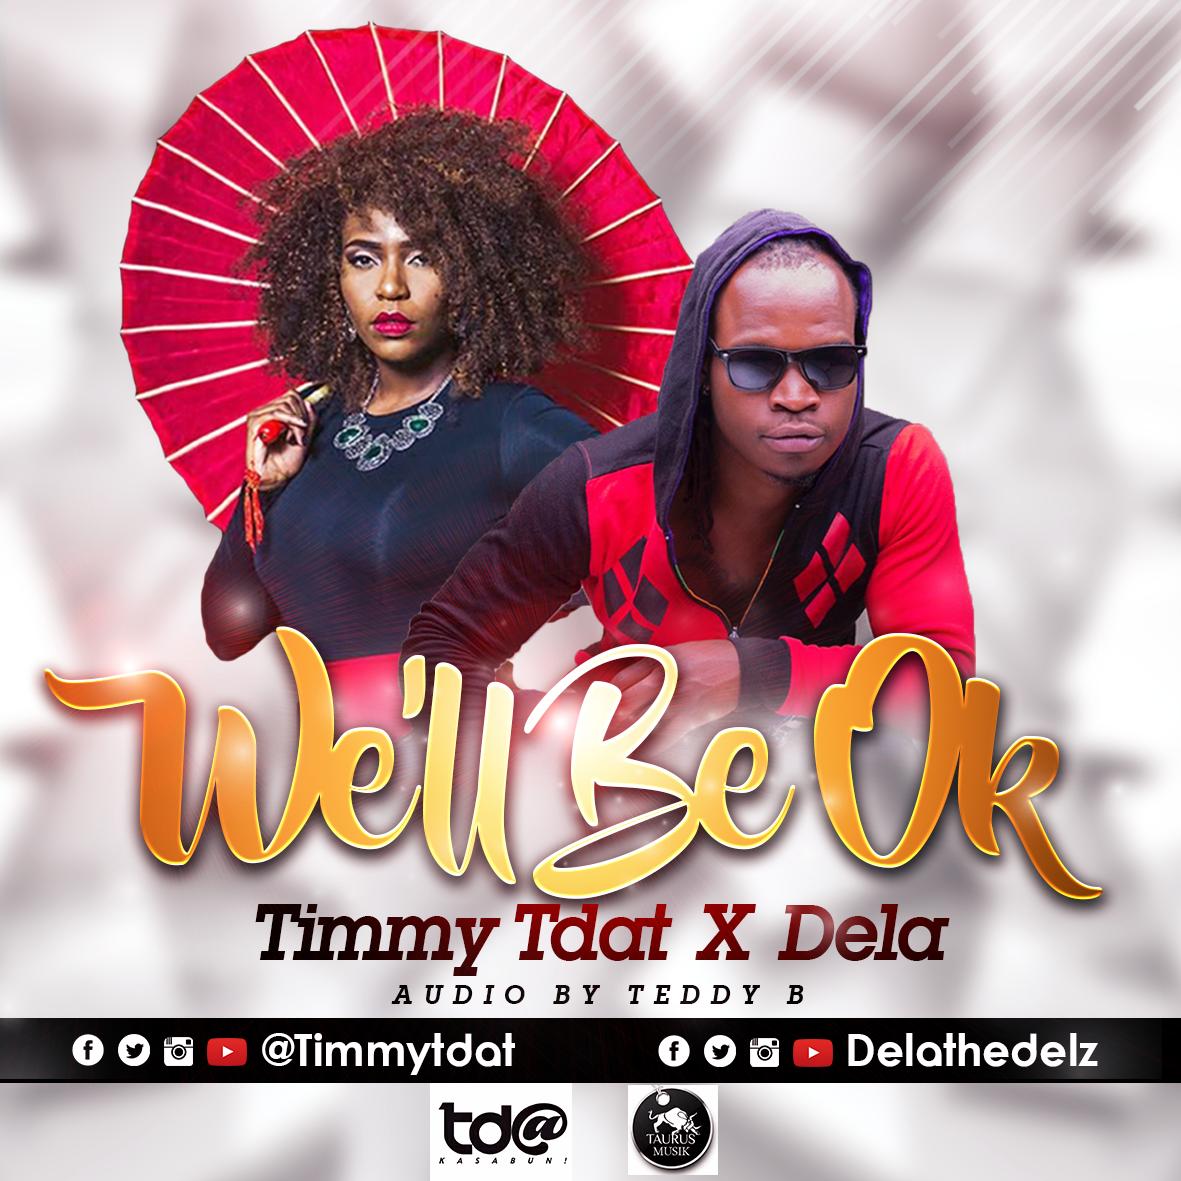 Timmy Tdat, Dela we'll be ok